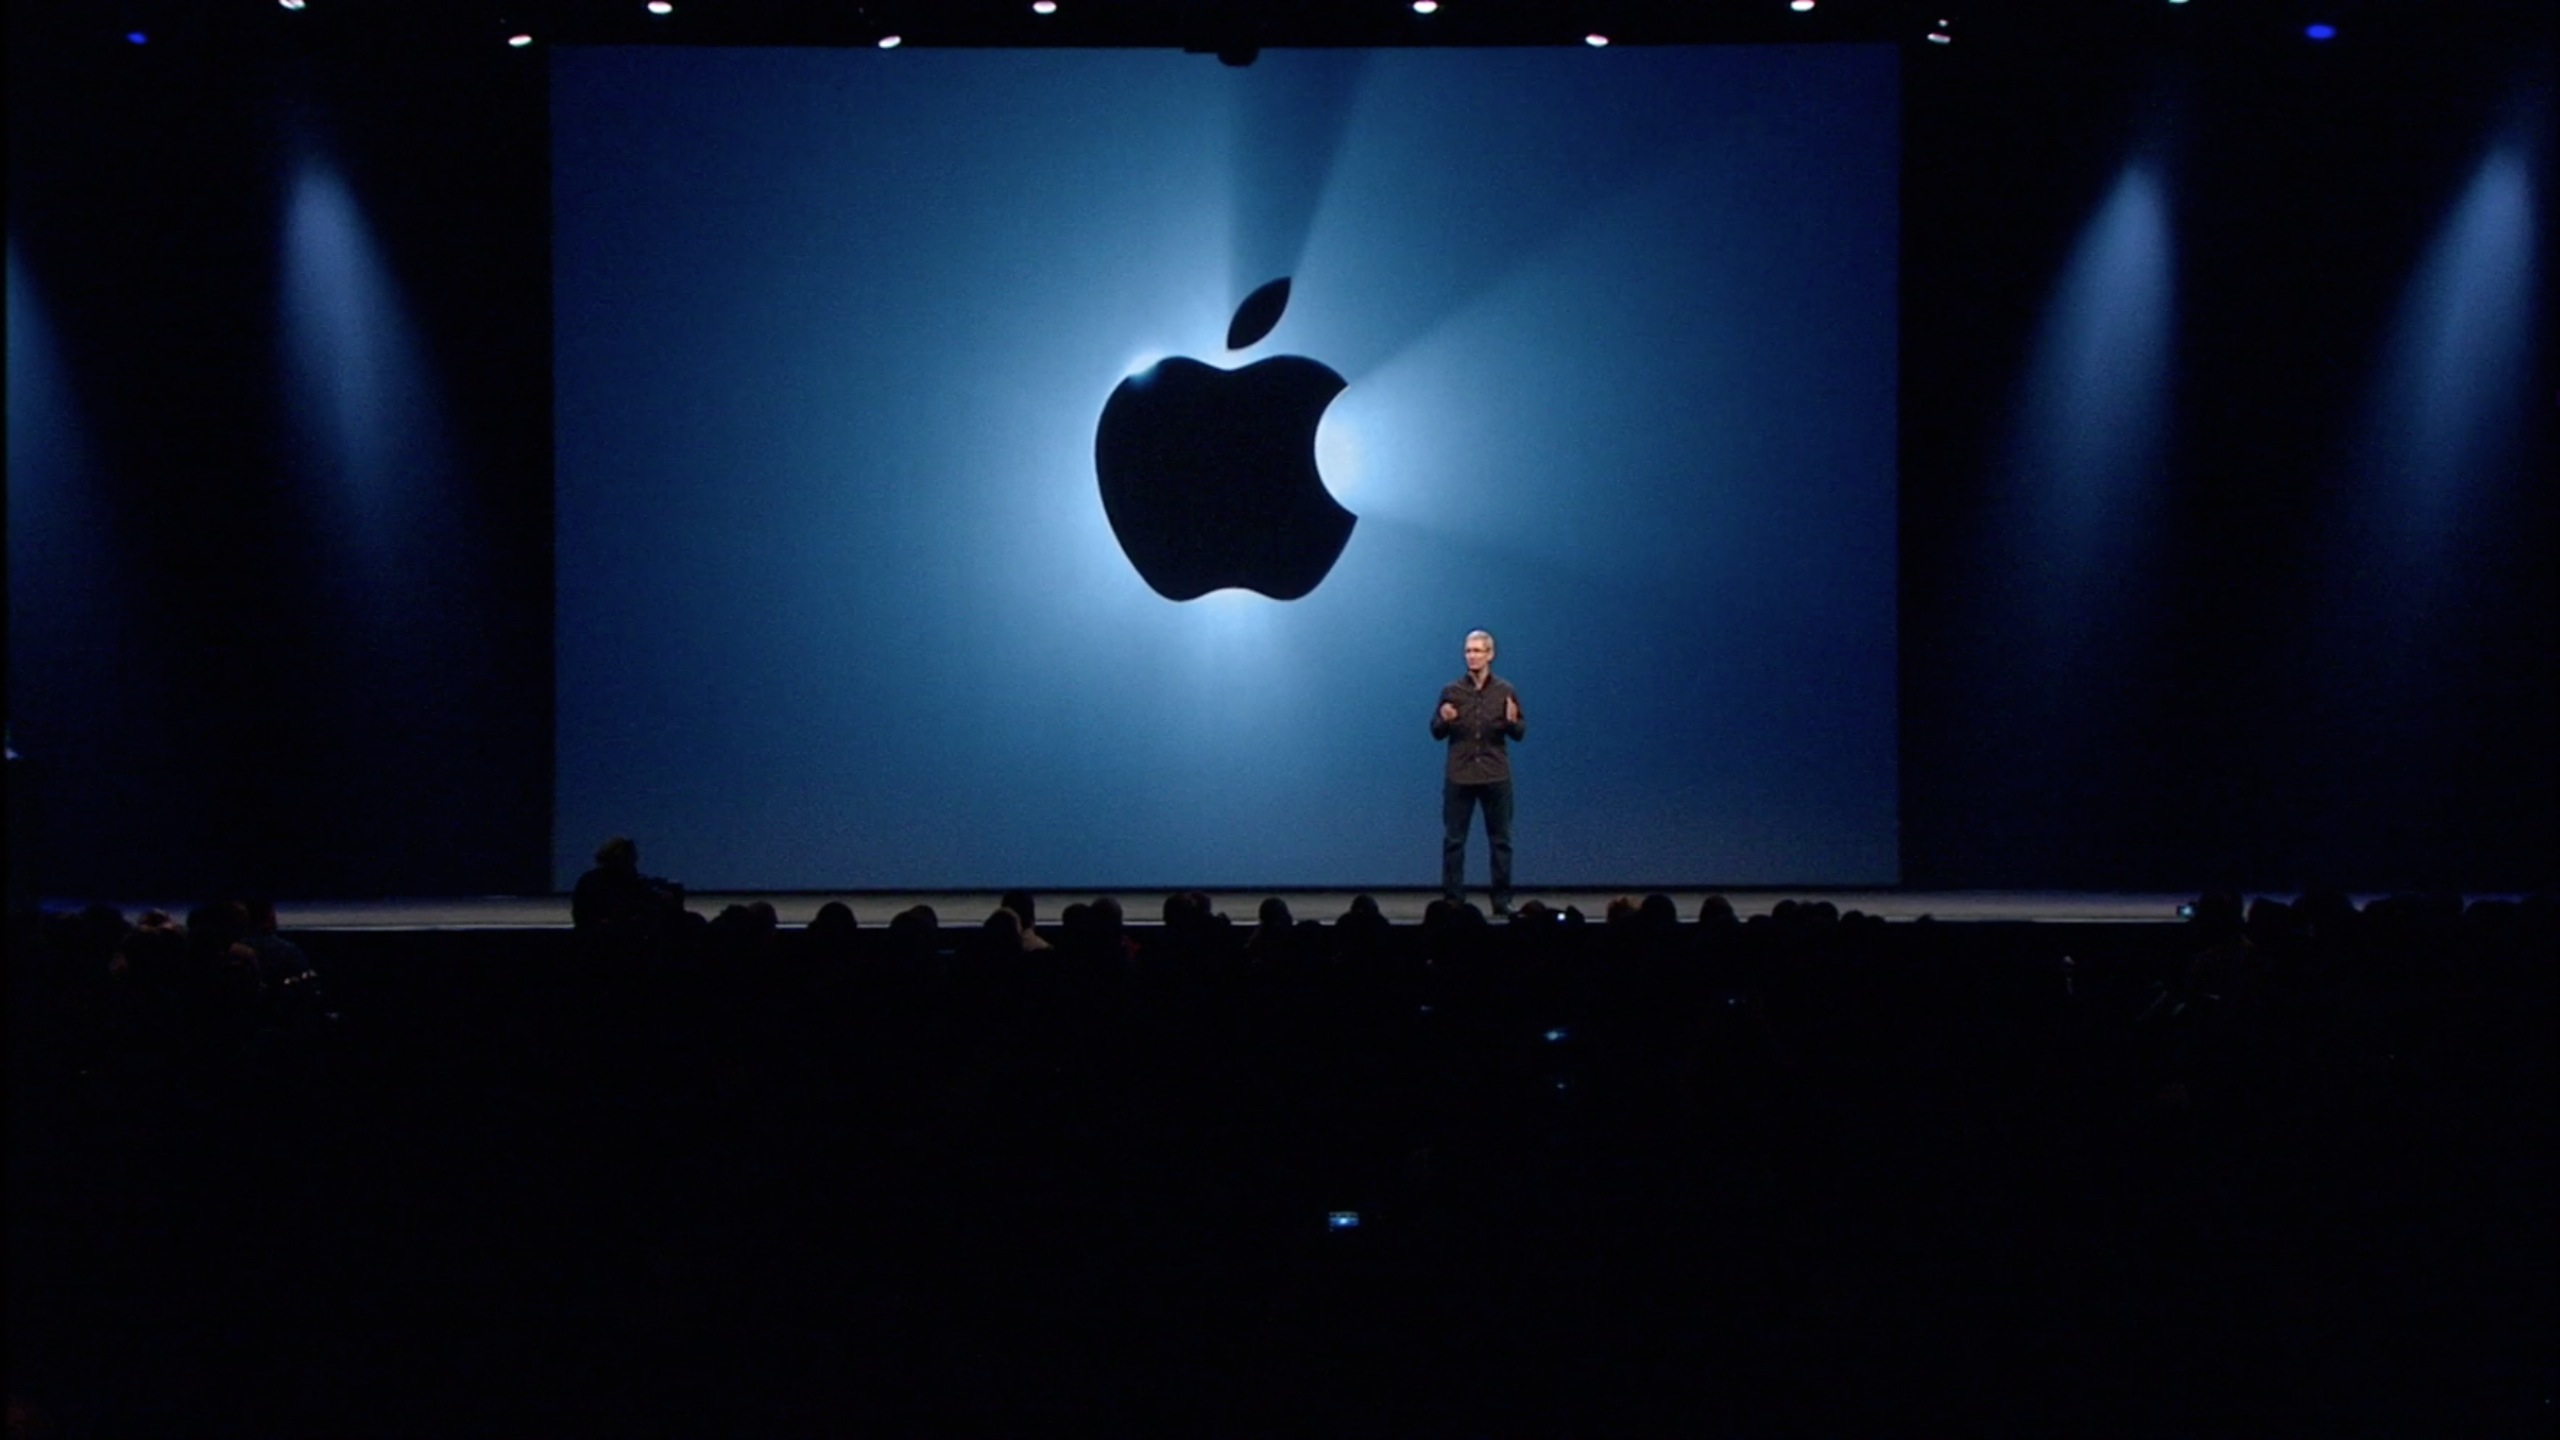 La Keynote d'Apple de mars promet de belles surprises